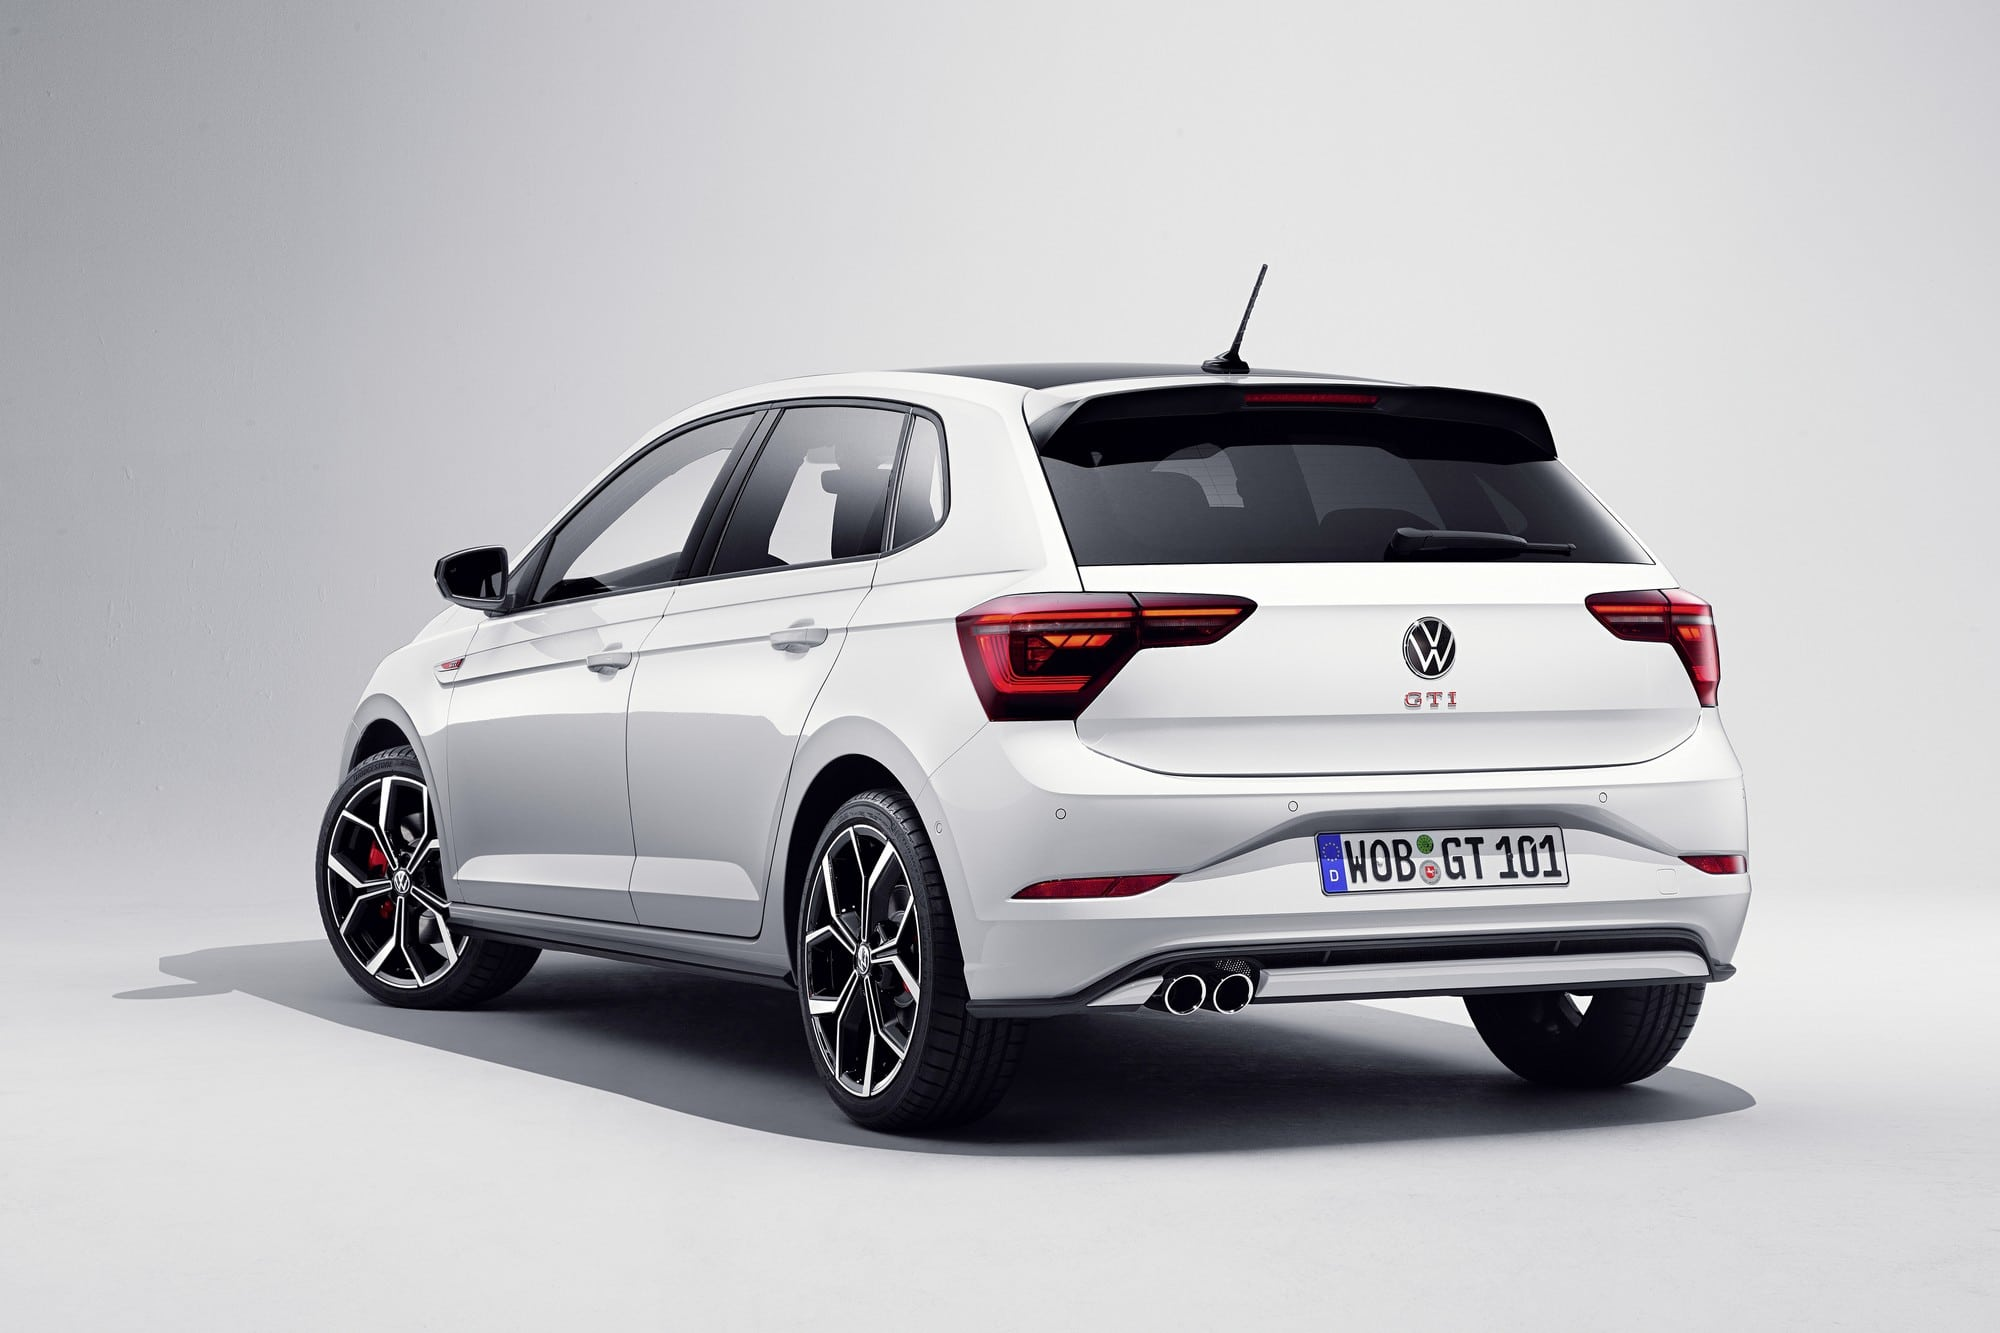 Nouvelle Volkswagen POlo GTI 2021